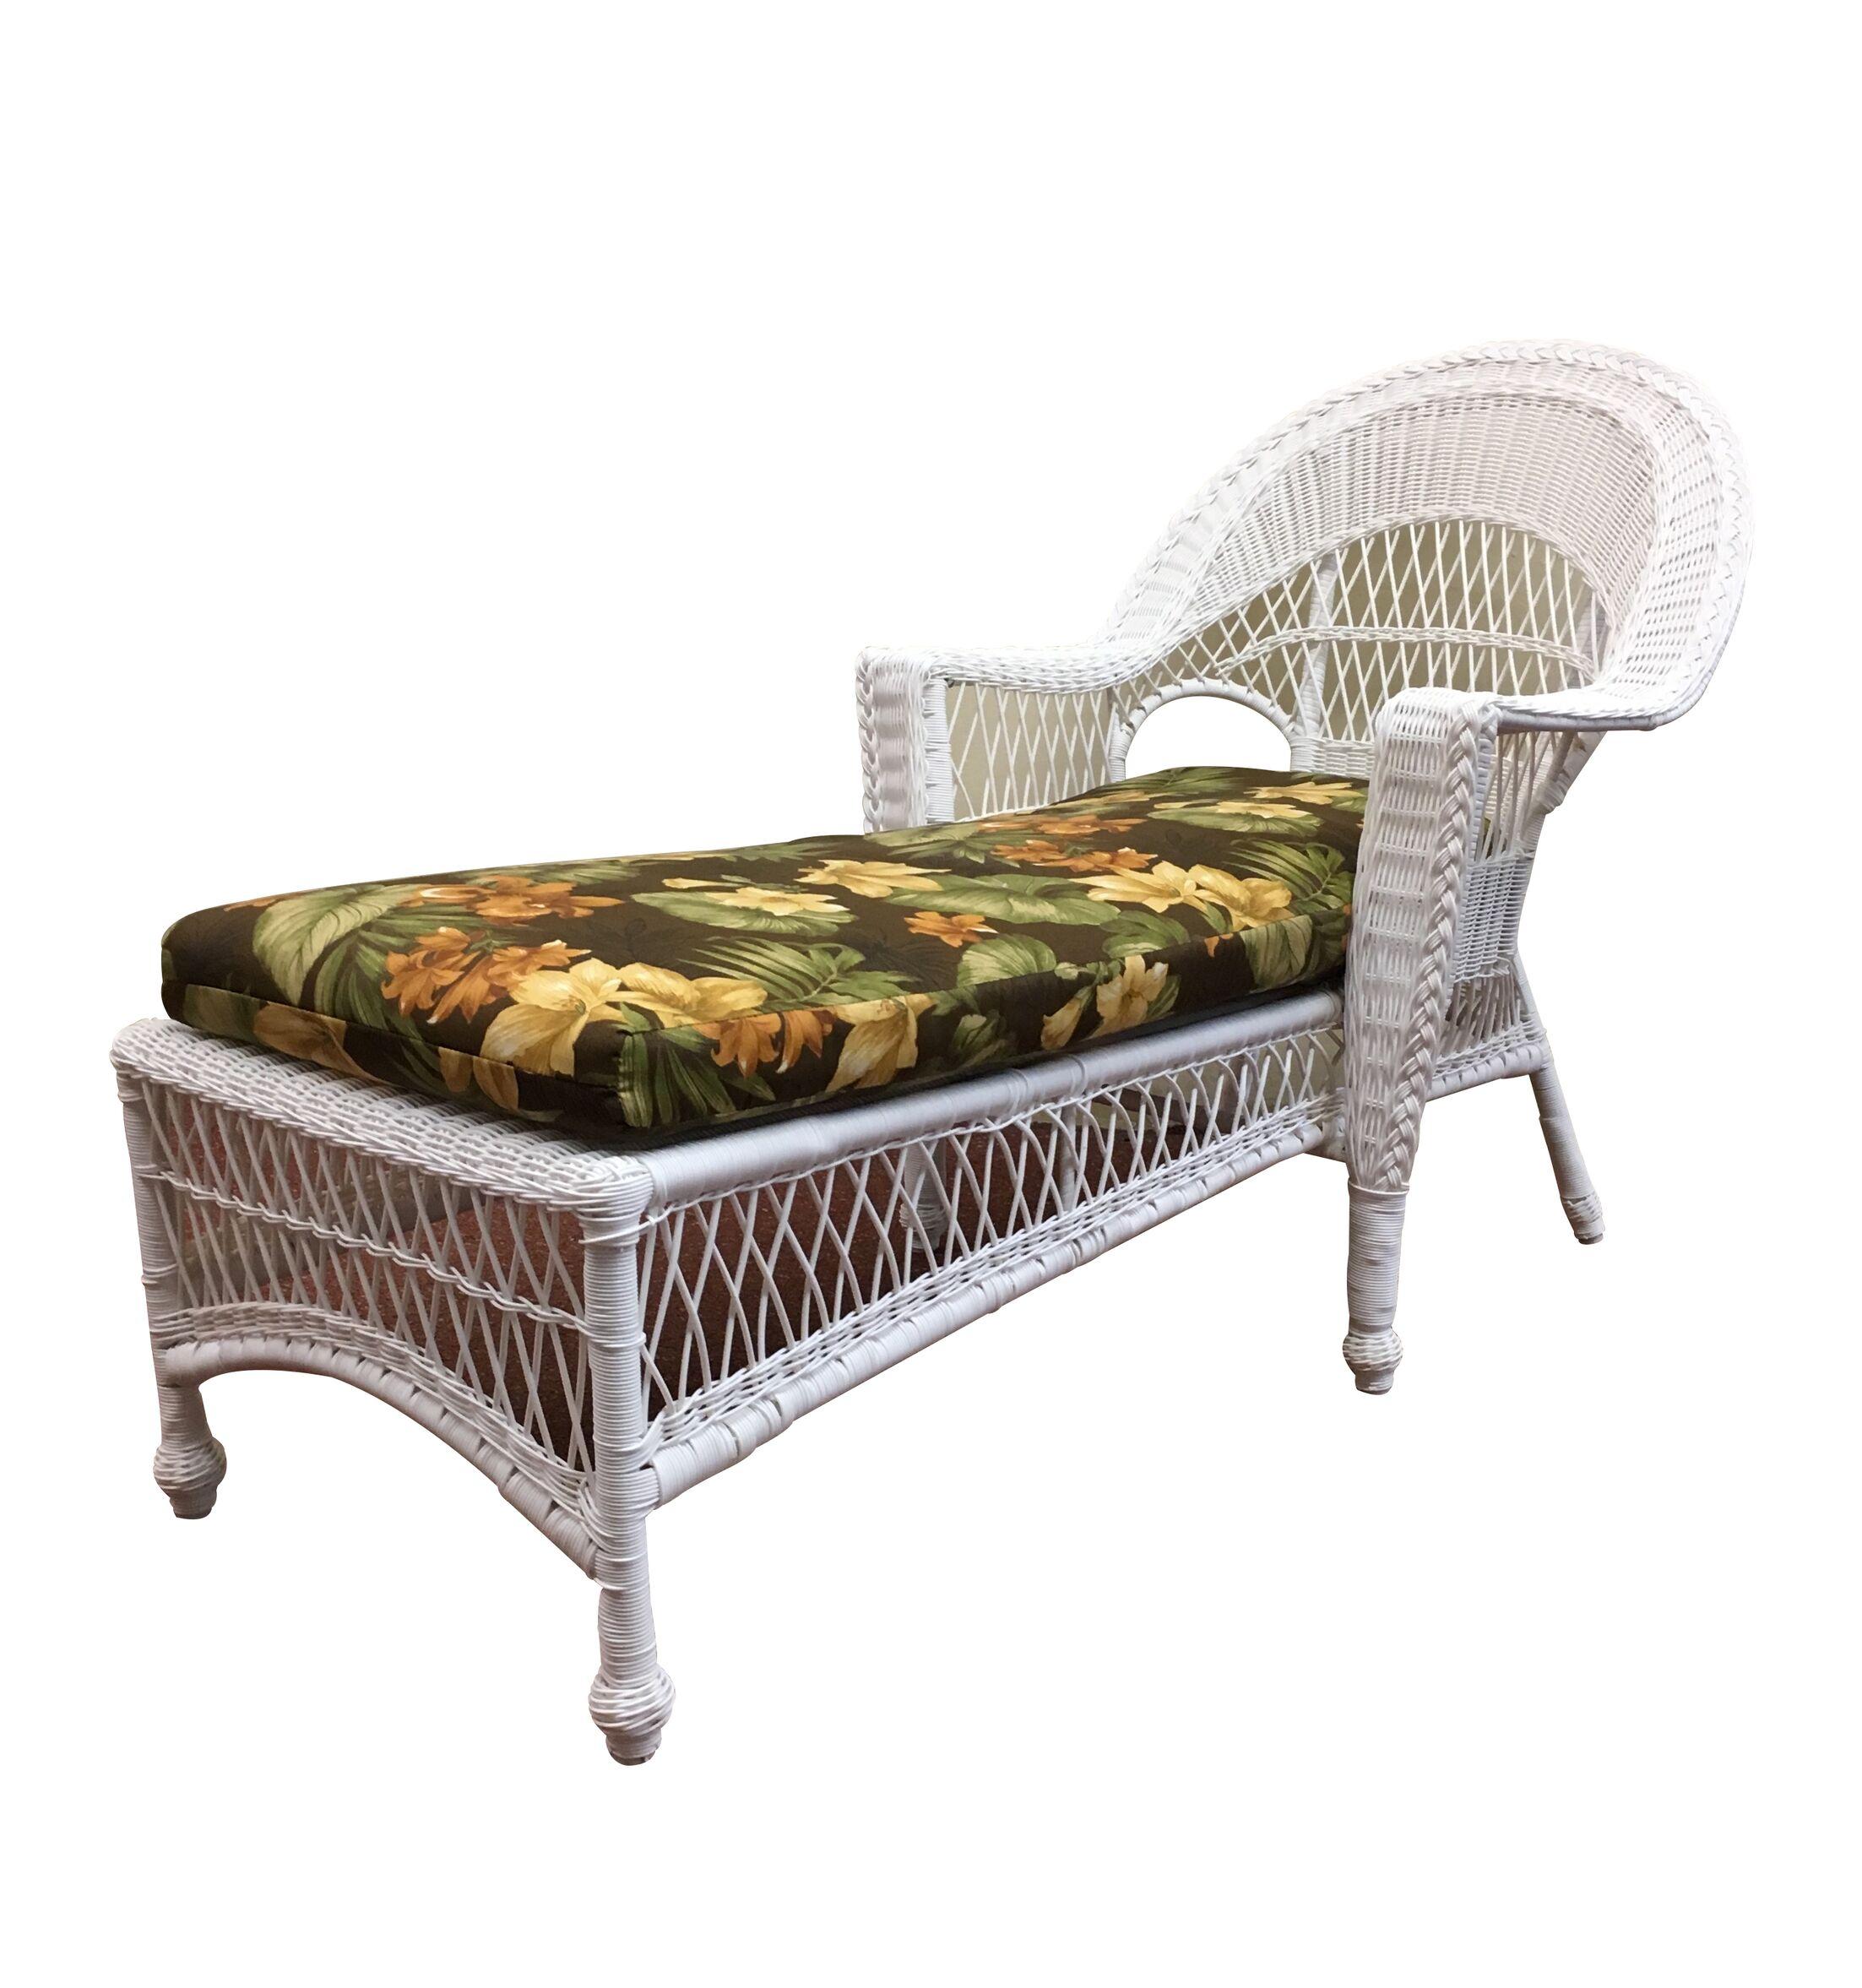 Camacho Chaise Lounge with Cushion Finish: White, Fabric: Callie Coffee